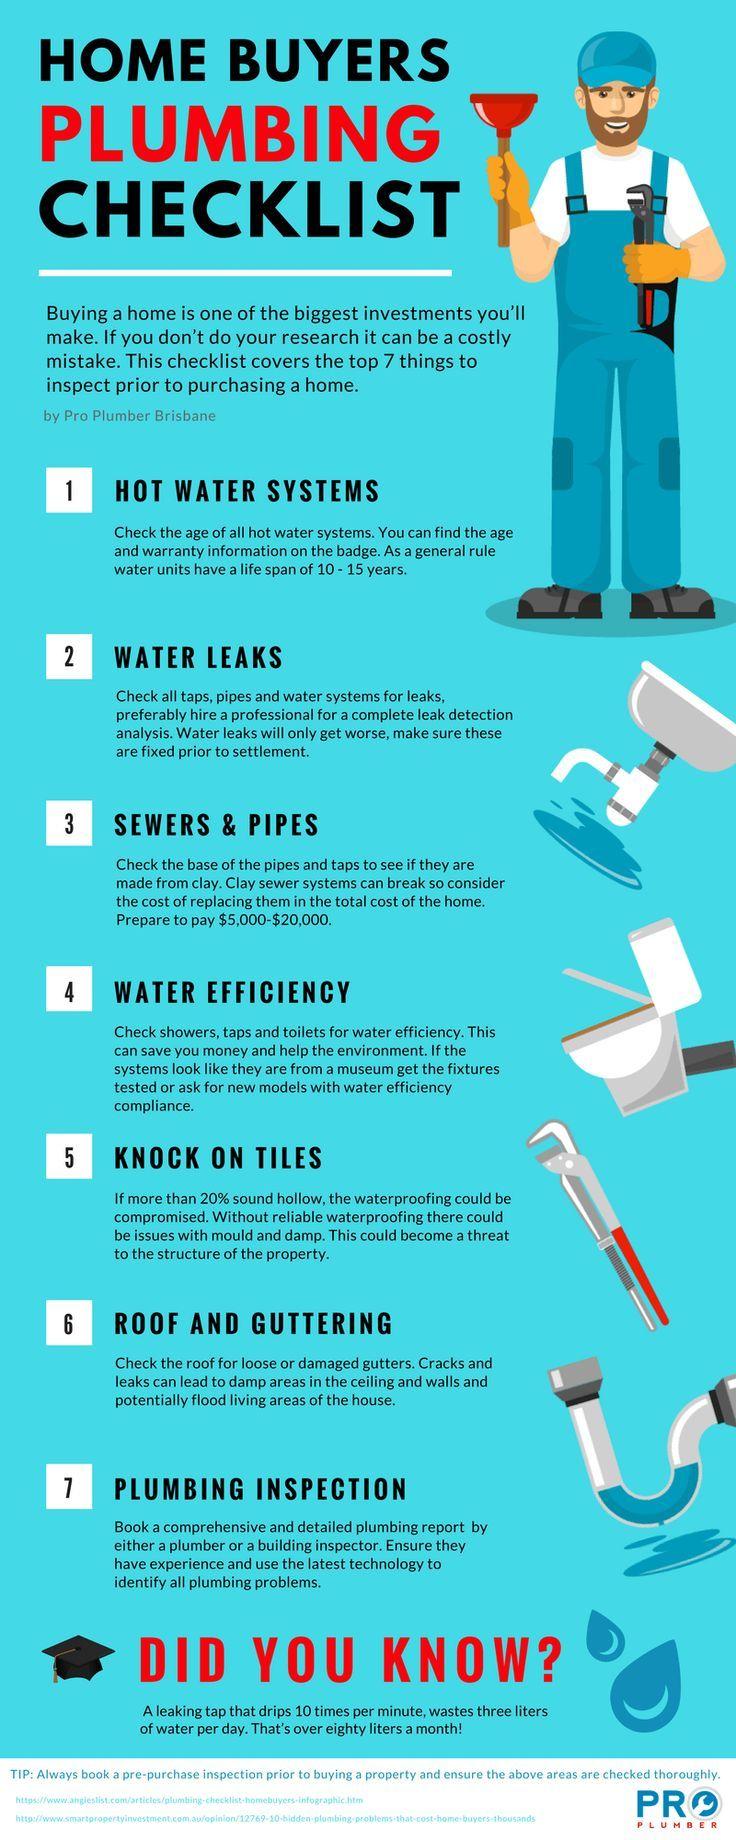 48 best Plumbing images on Pinterest | Bathrooms, Bathroom and ...